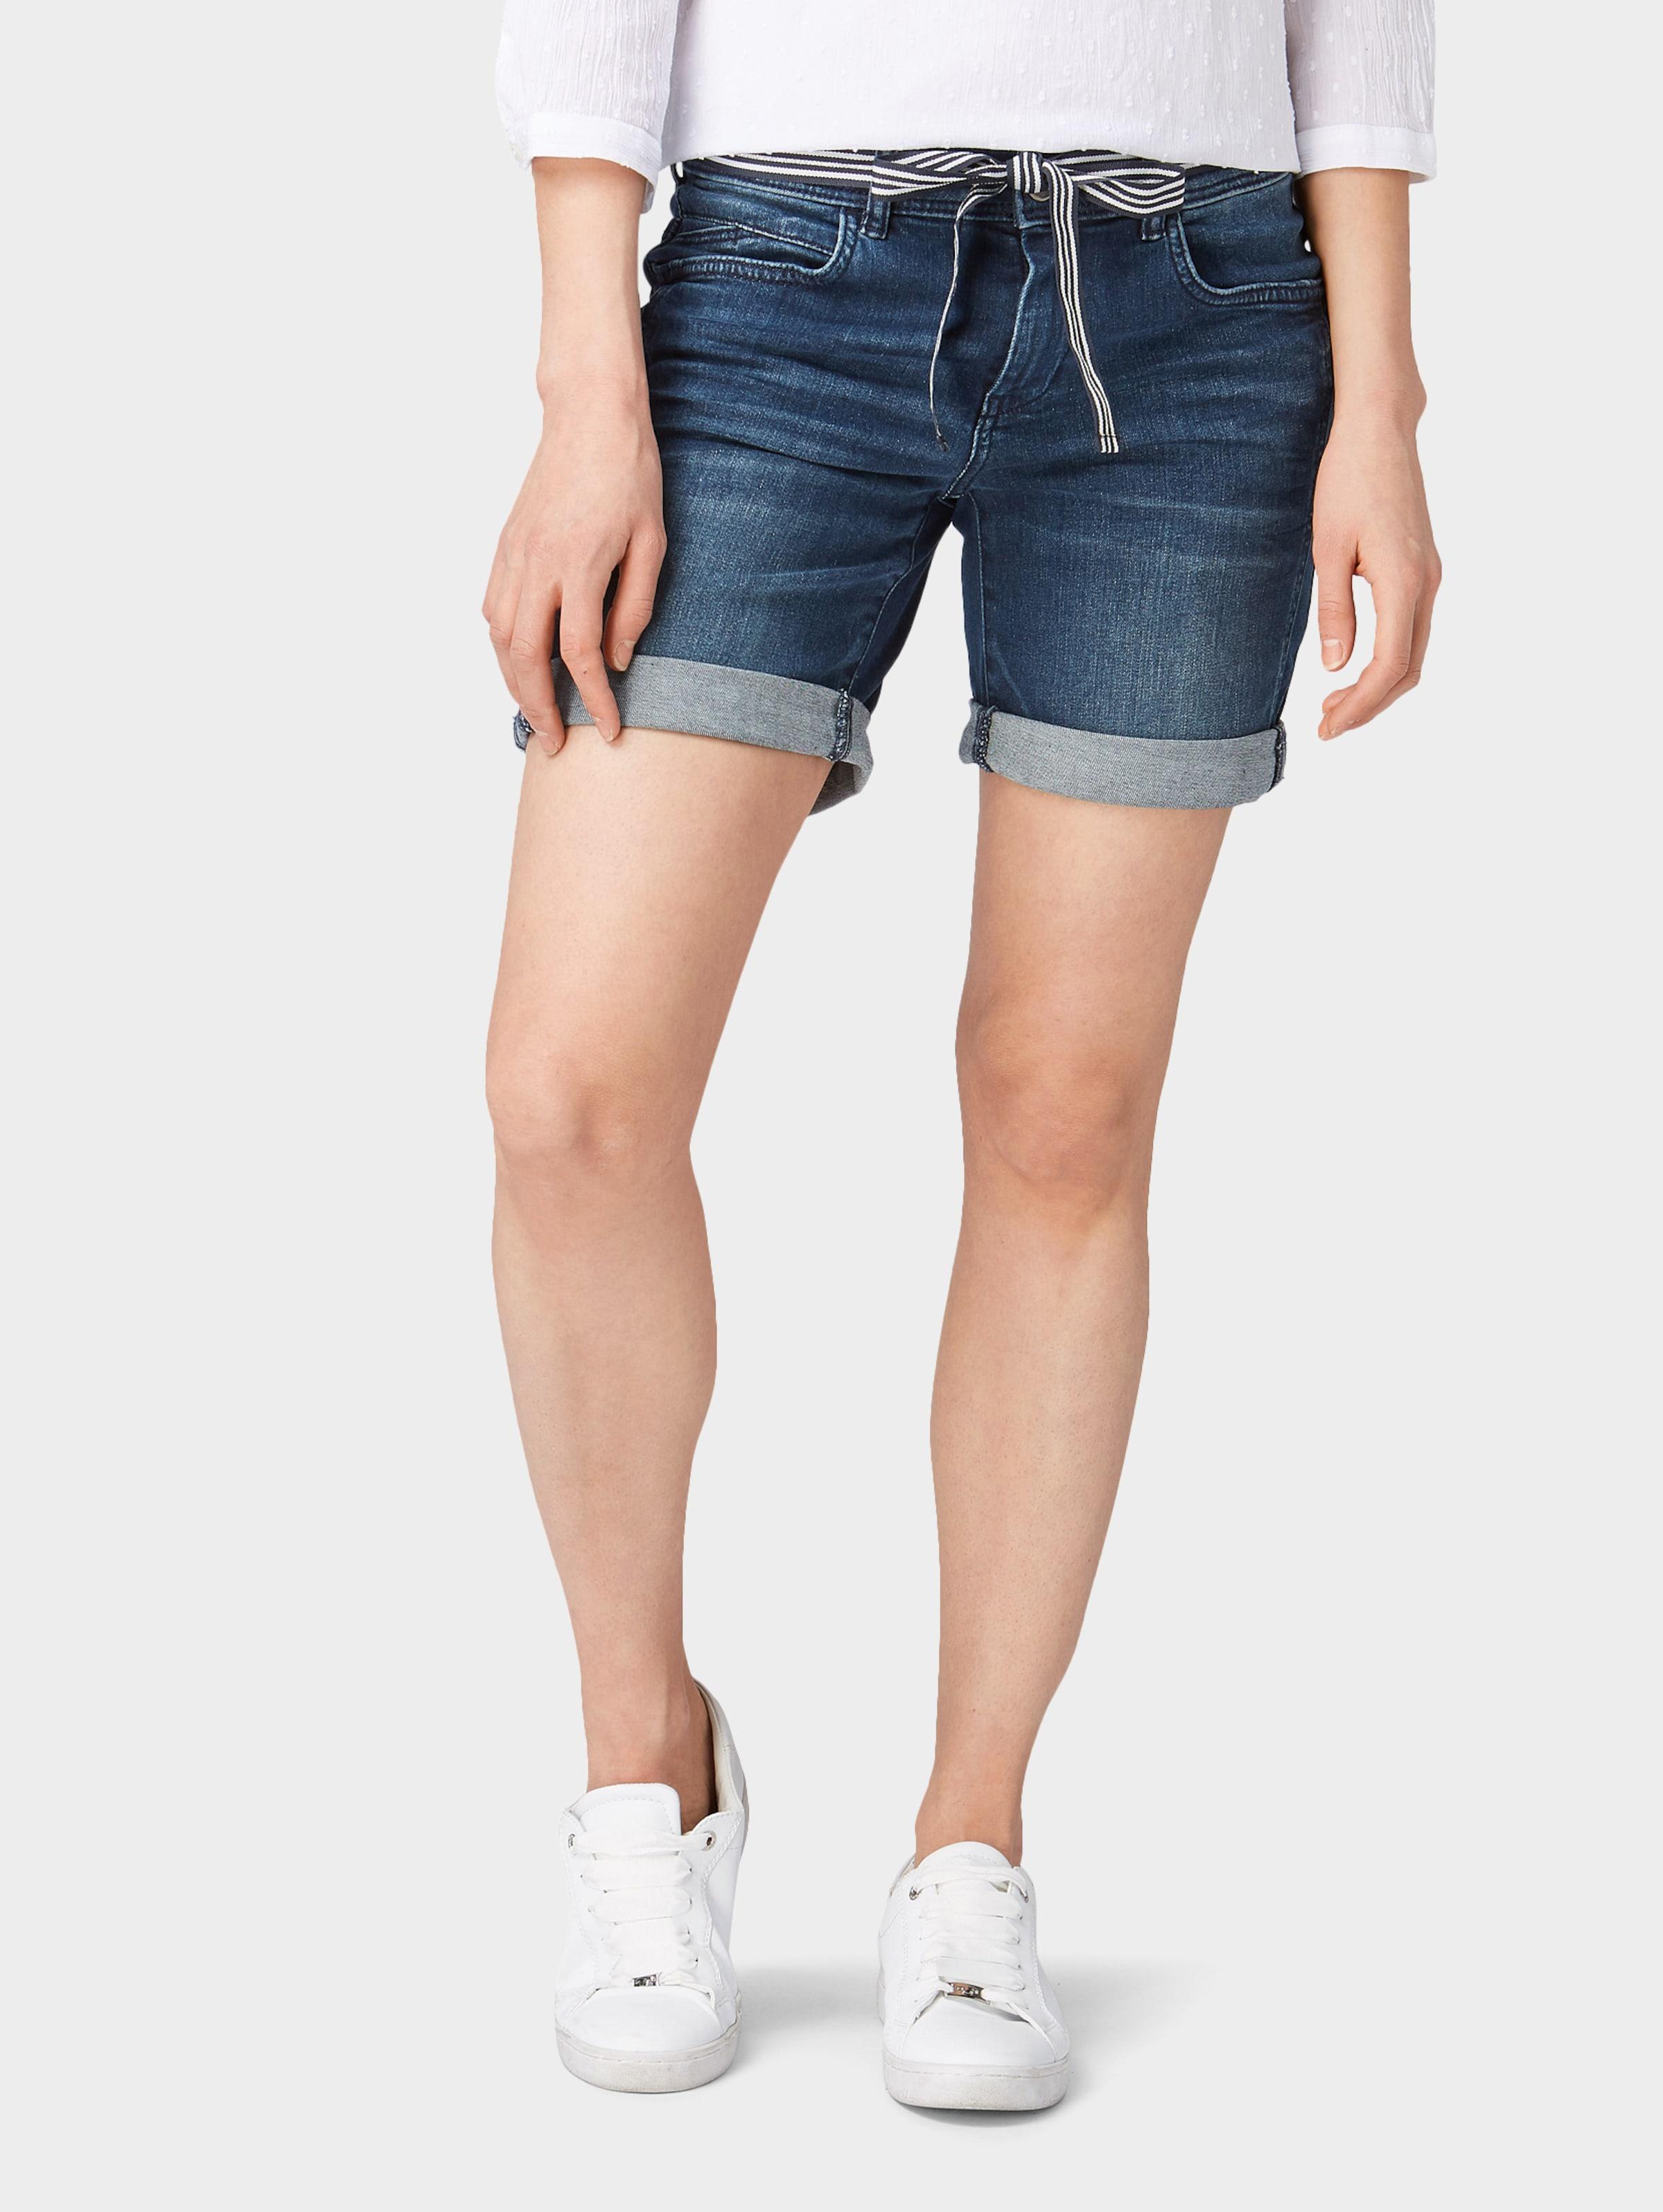 Denim Shorts Tailor 'alexa' In Blue Tom EIY9WHe2D